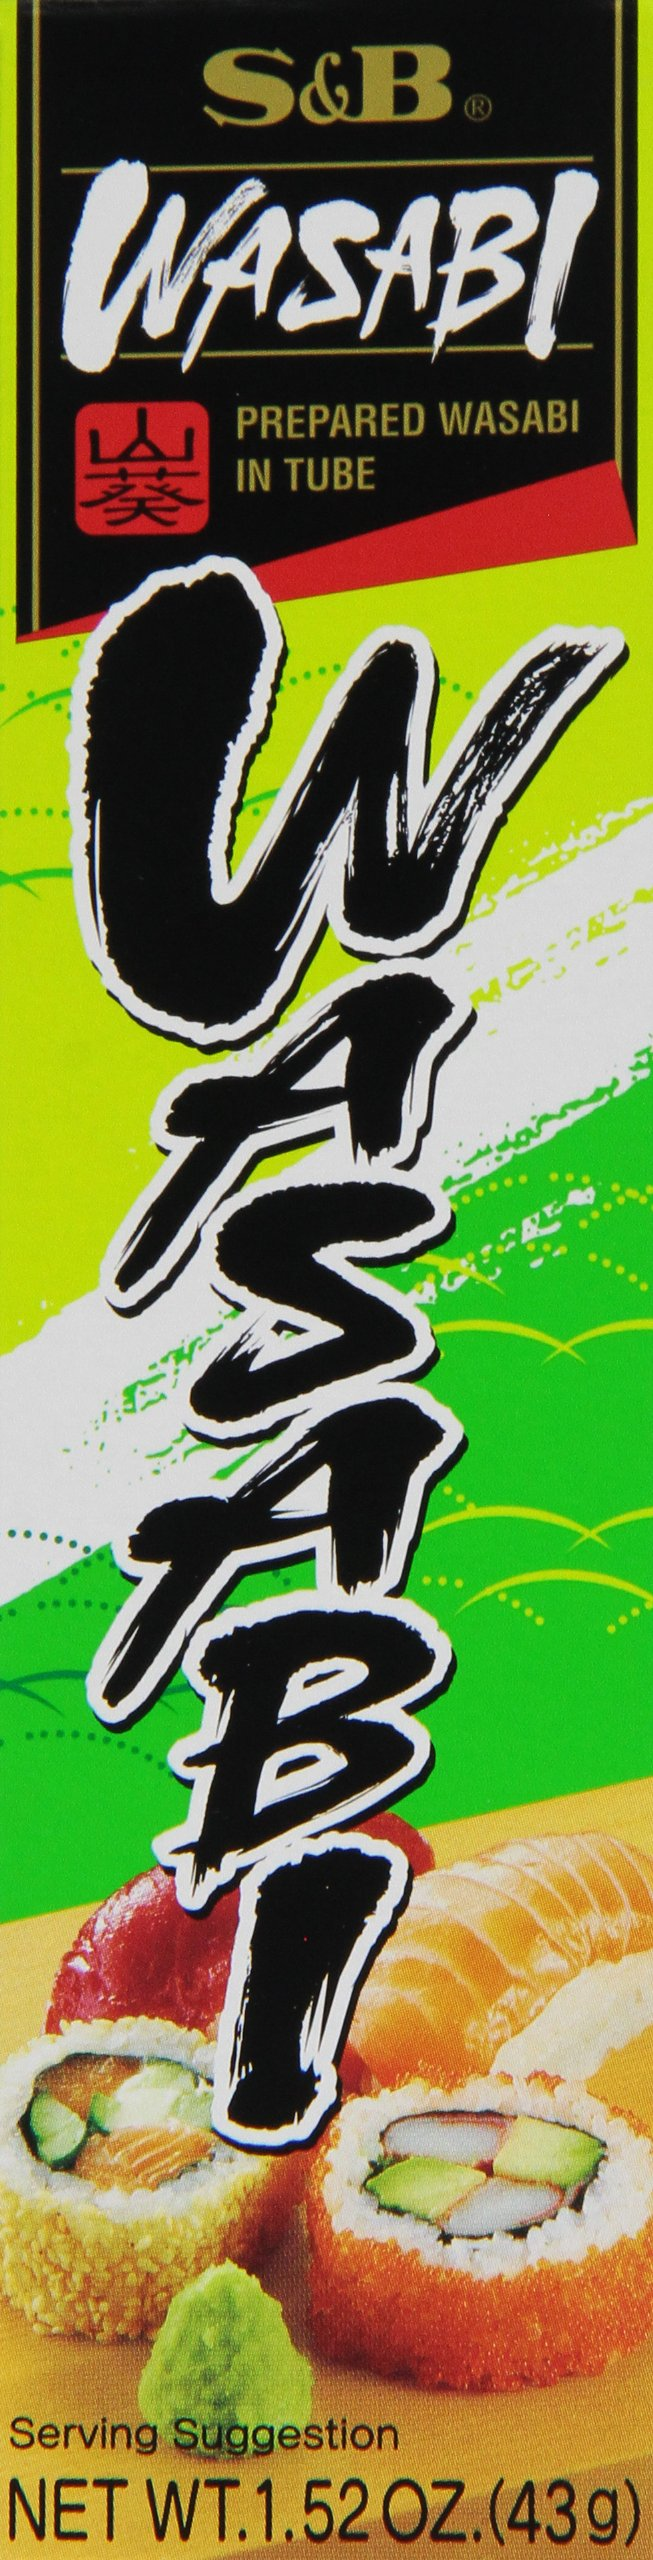 S&B Prepared Wasabi in Tube, 1.52 oz (43 g) tubes (Pack of 10)